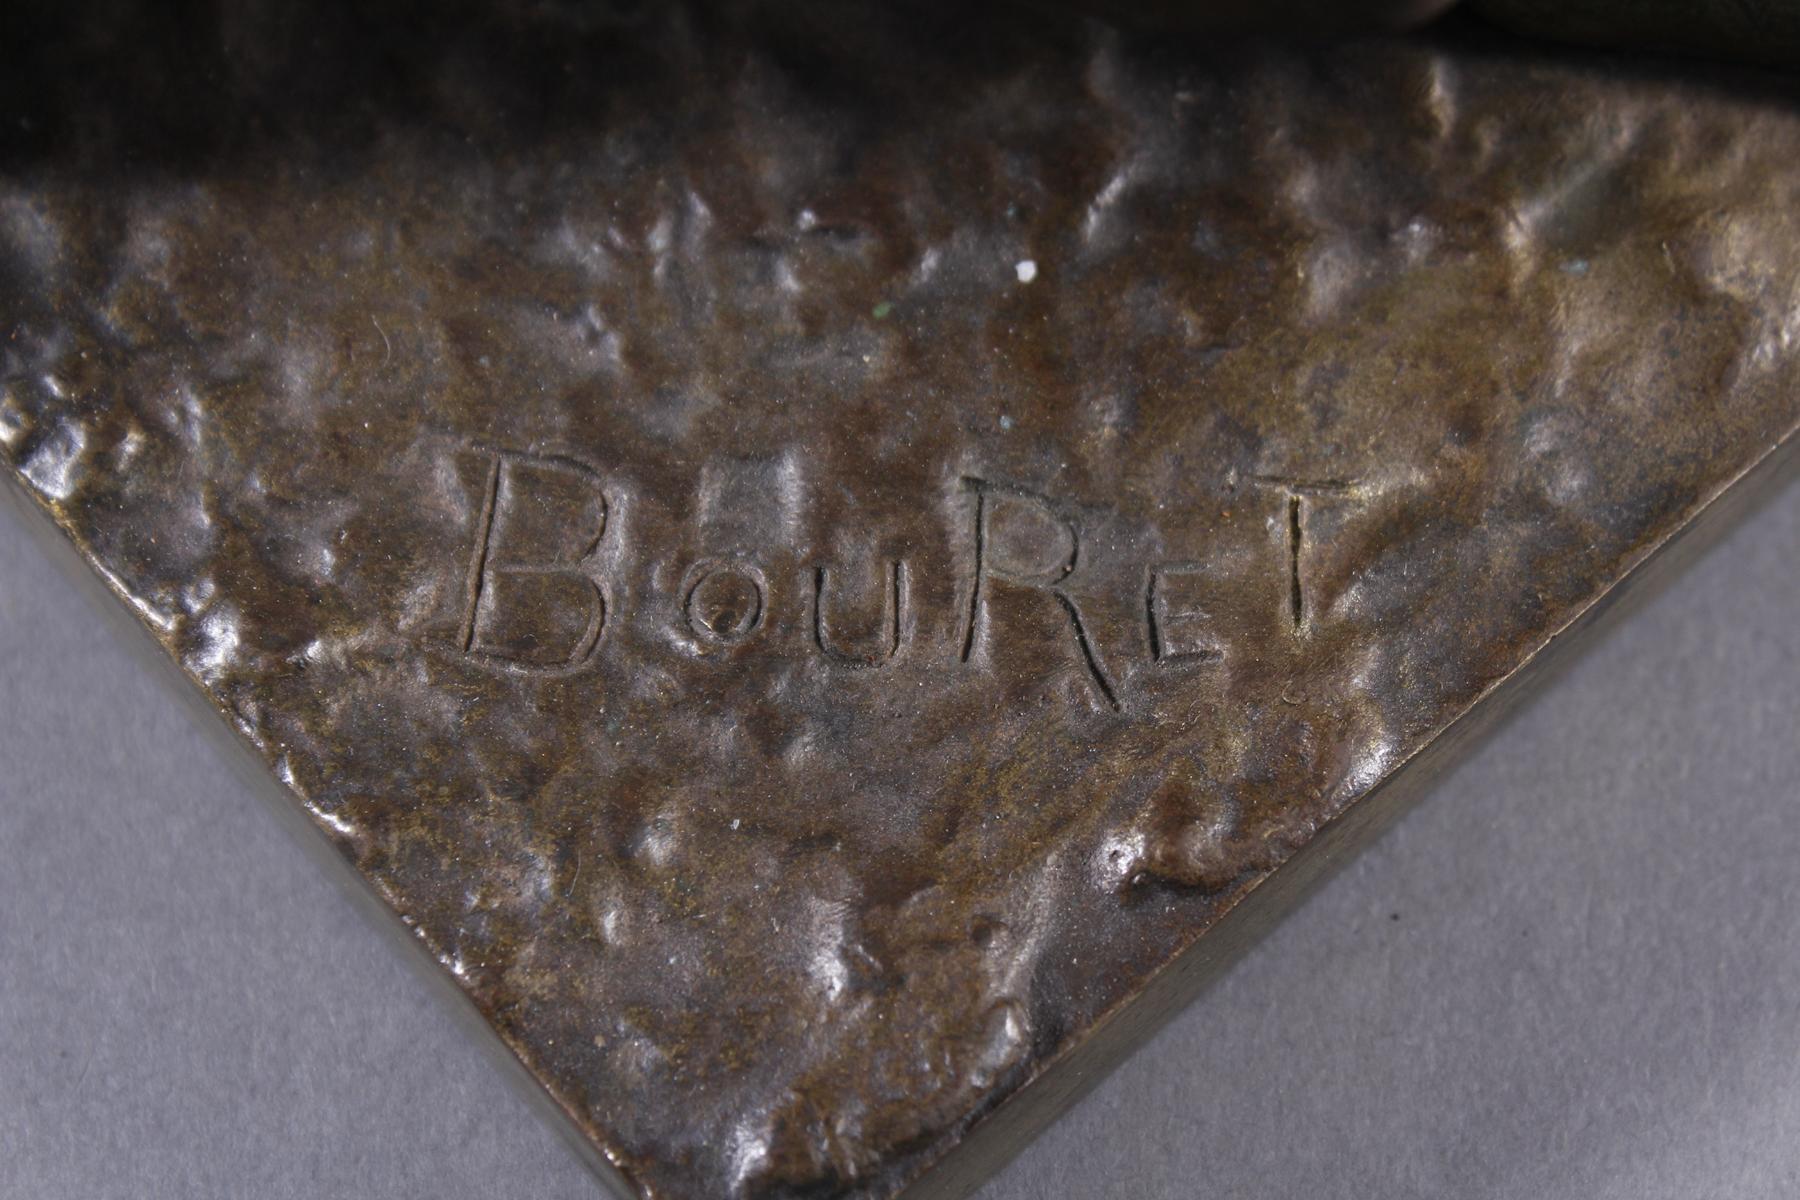 Eutrope Bouret (1833-1906), Bronzeskulptur 'Au claire de la Lune' um 1890/1900-8